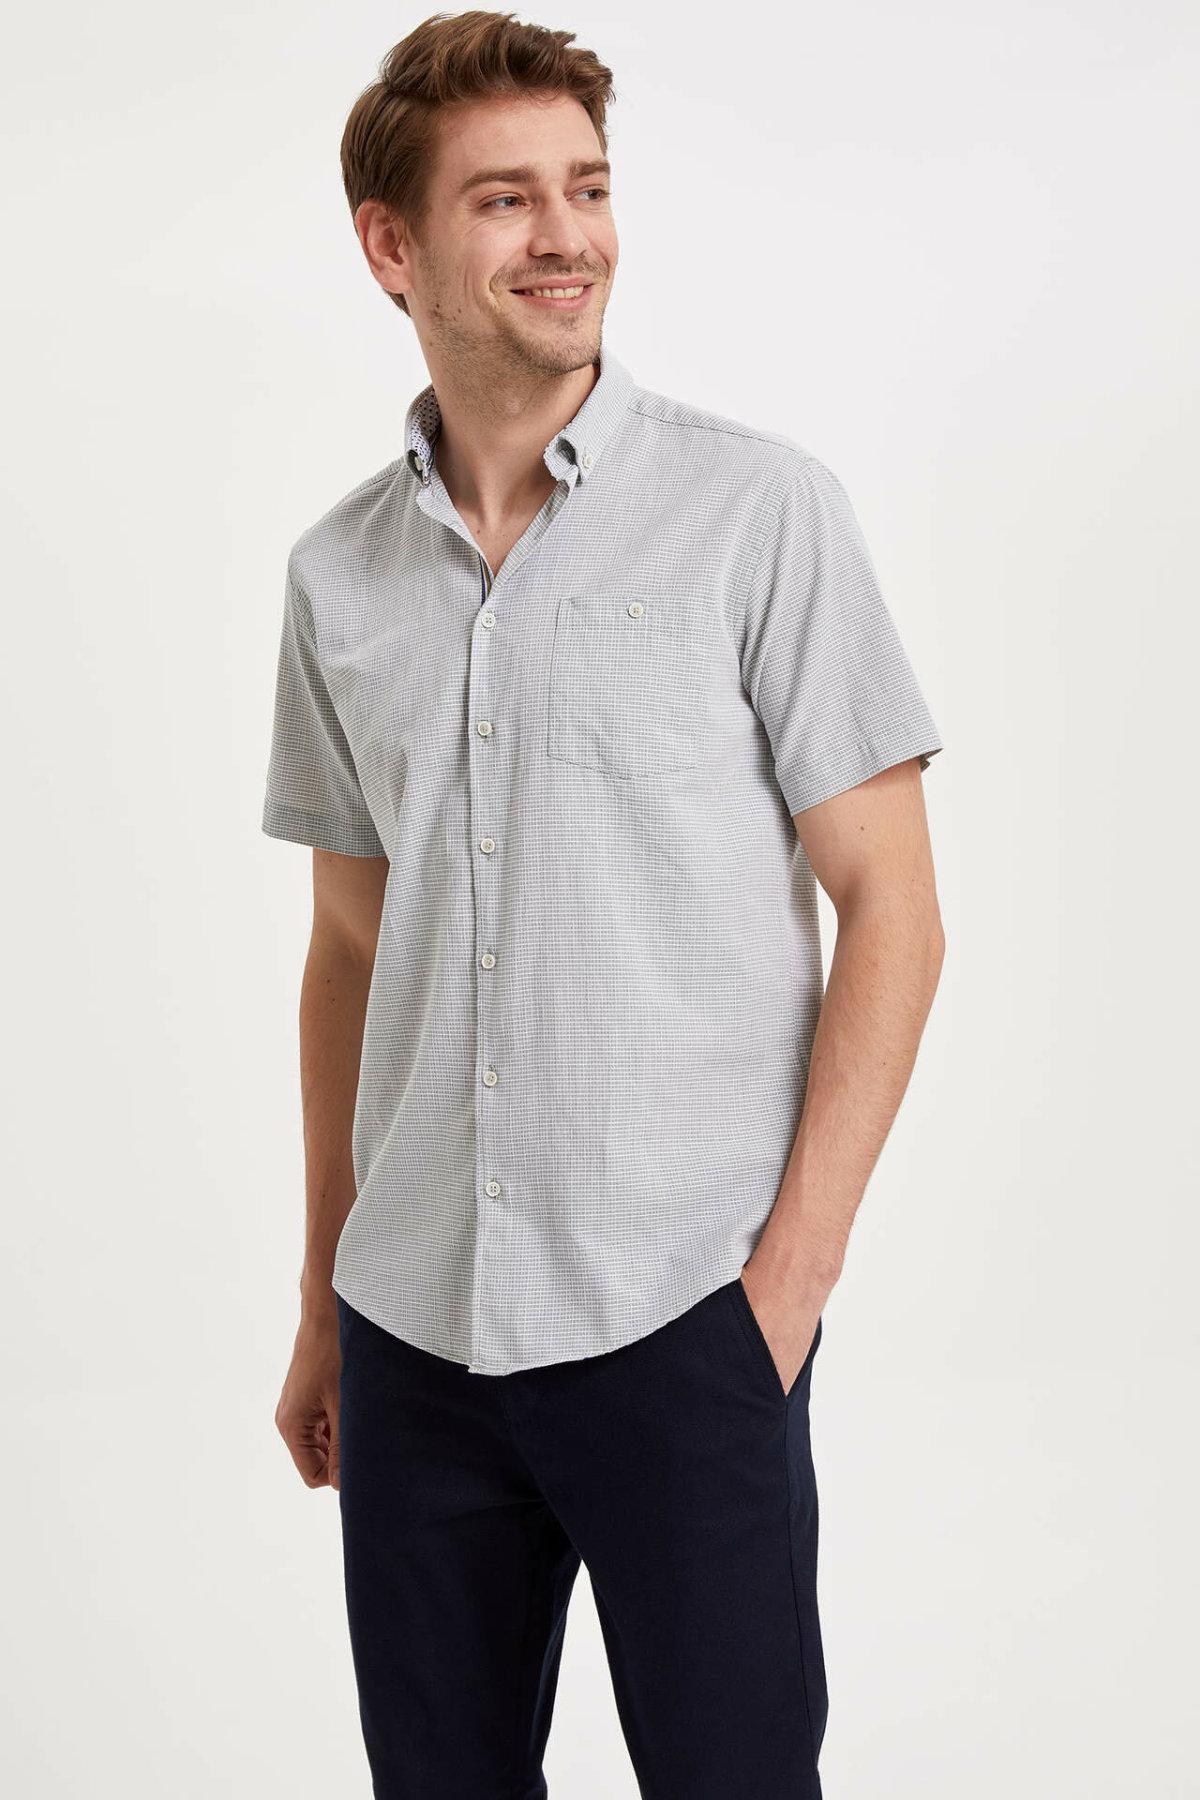 DeFacto Men Simple Solid Shirts Short Sleeve Casual Shirts Men Fashion Lapel Collar Shirt - K2947AZ19SMGN460-K2947AZ19SM